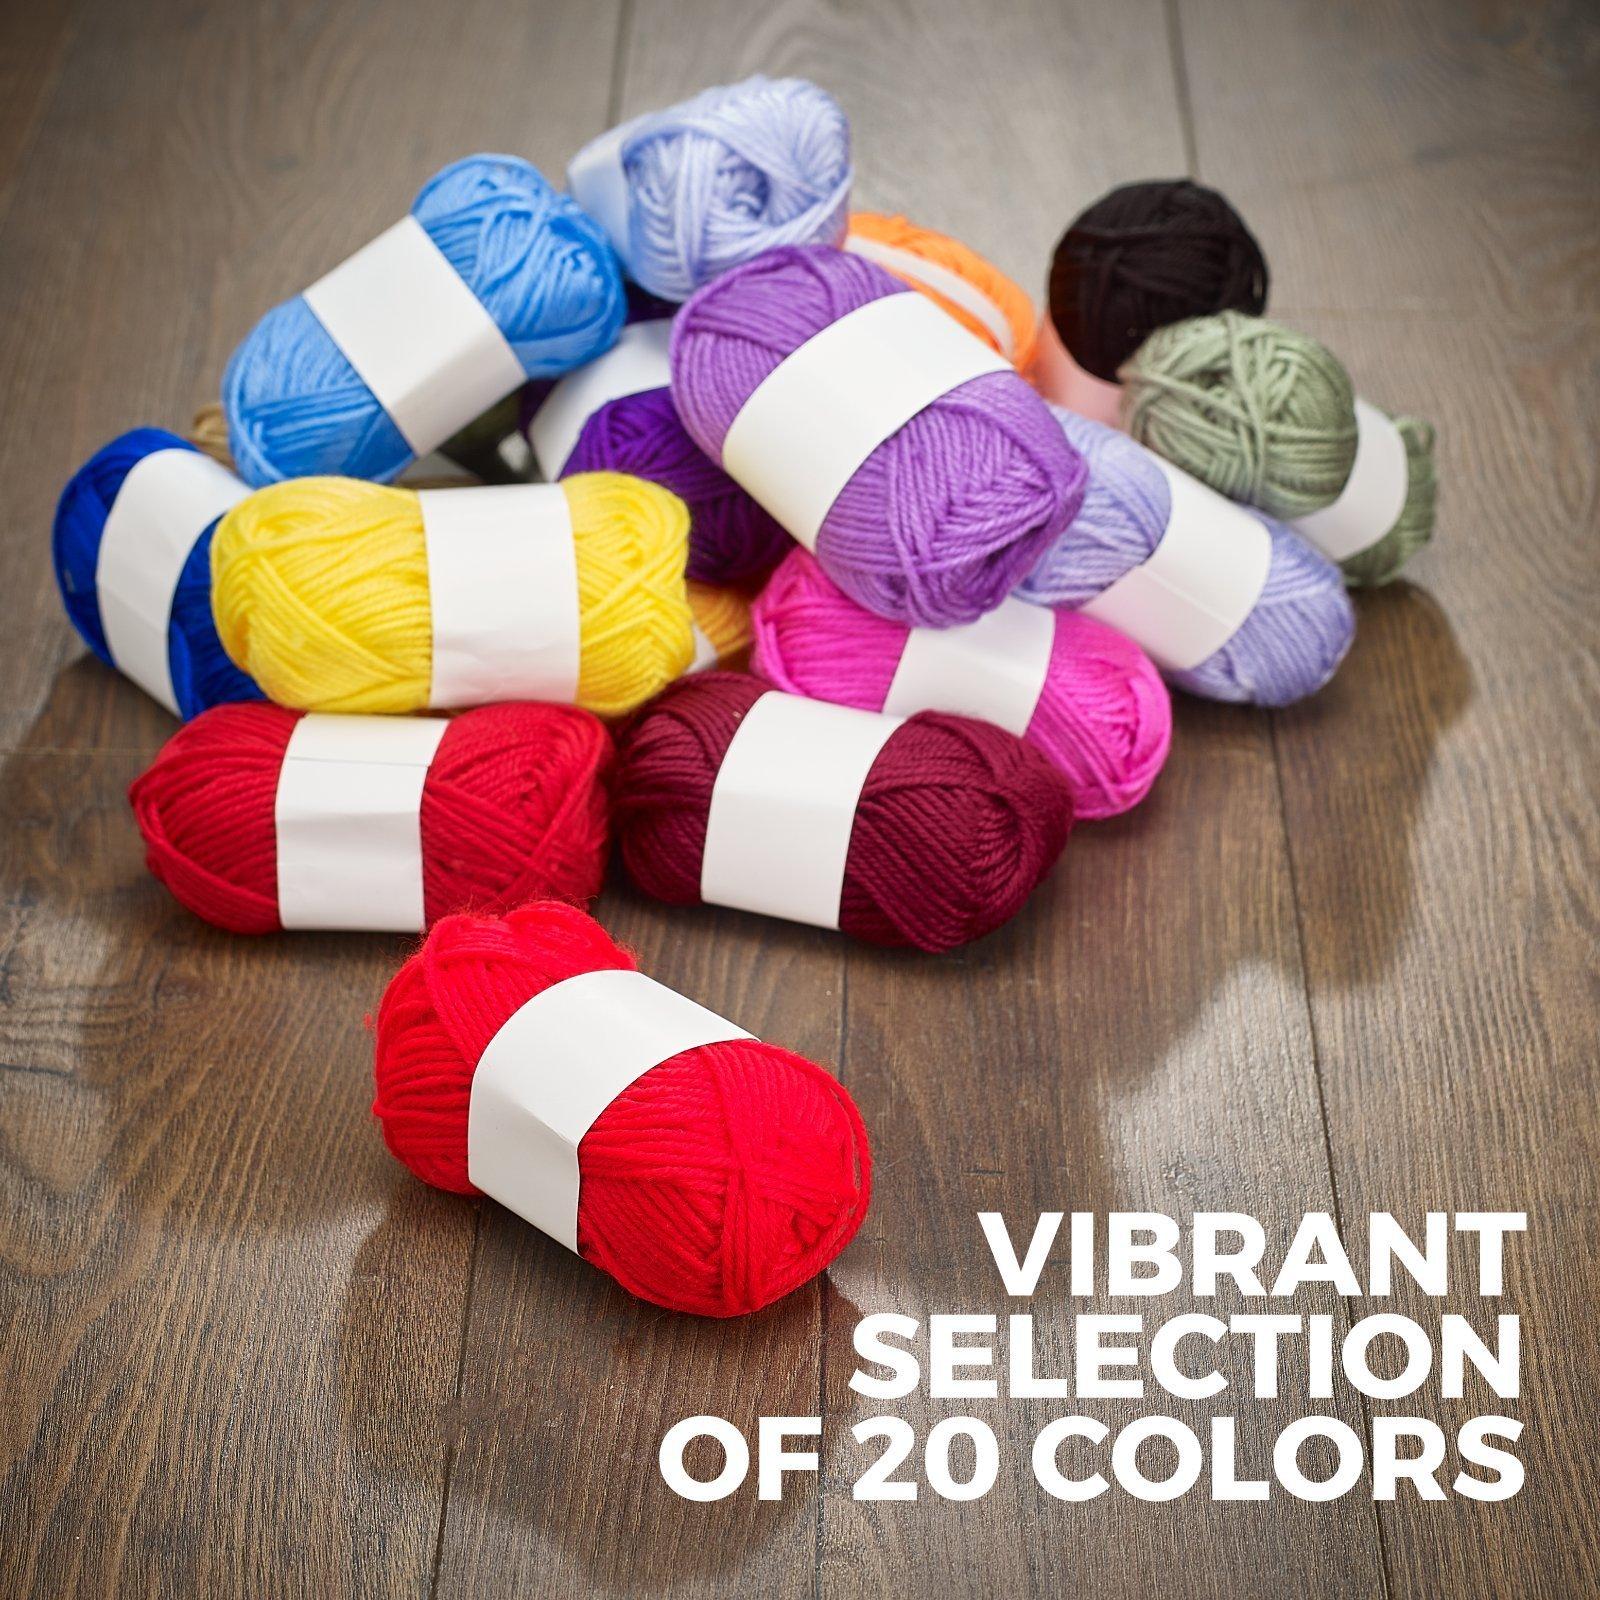 Mind My Thread 20 Super Soft Acrylic Yarn Skeins Set | Assorted Colors Crochet & Knitting Craft Yarn Kit with Reusable Storage Bag & Bonus Crochet Hook | 20 Colors Yarn Multi Pack by Mind My Thread (Image #3)